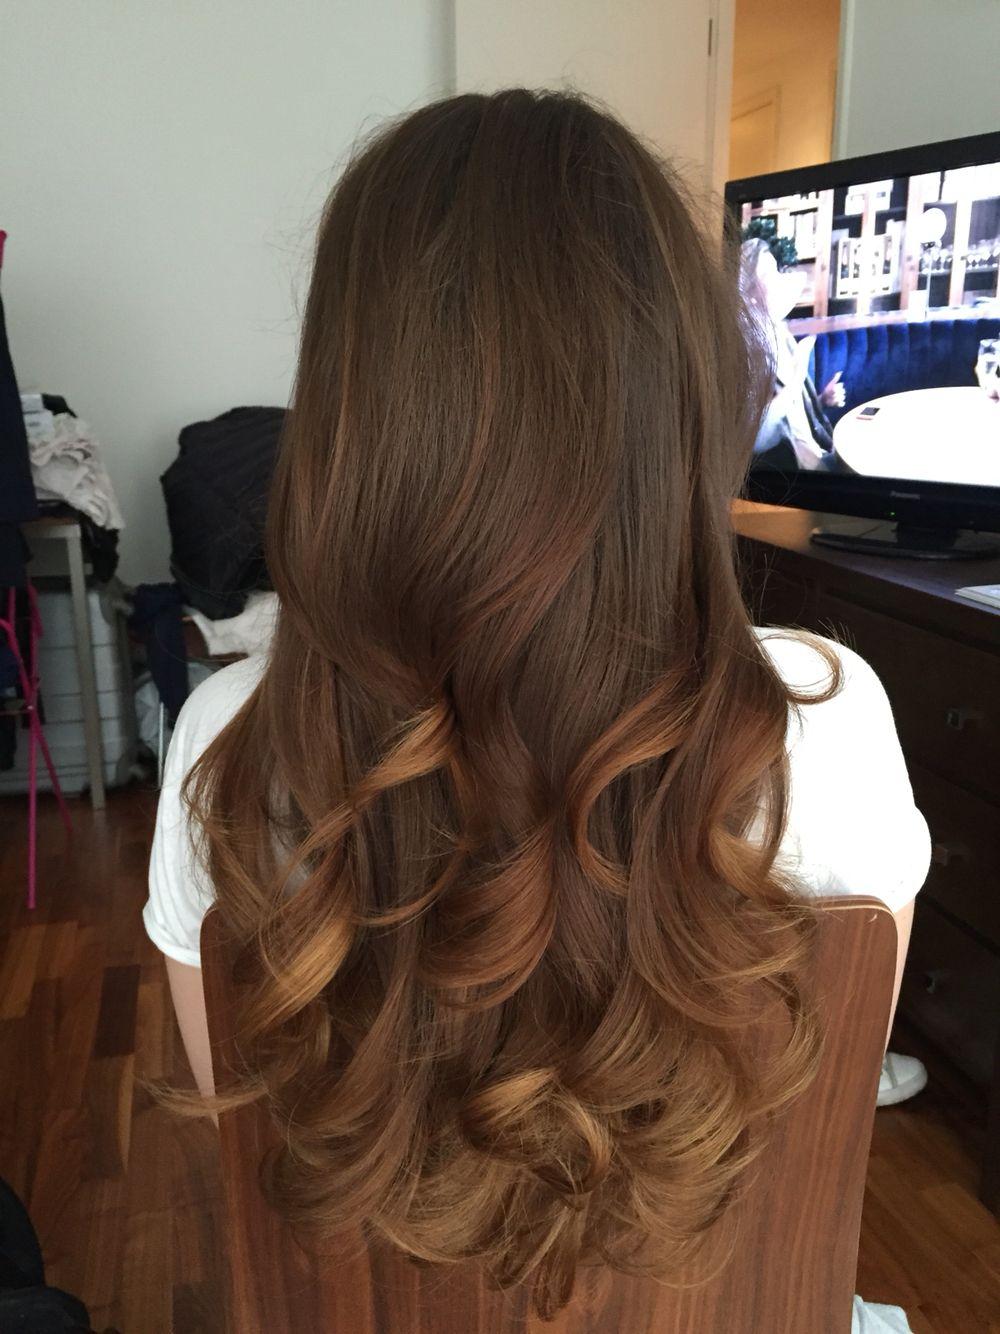 Hair Salon Mobile App  How will it help me  Hair Styles